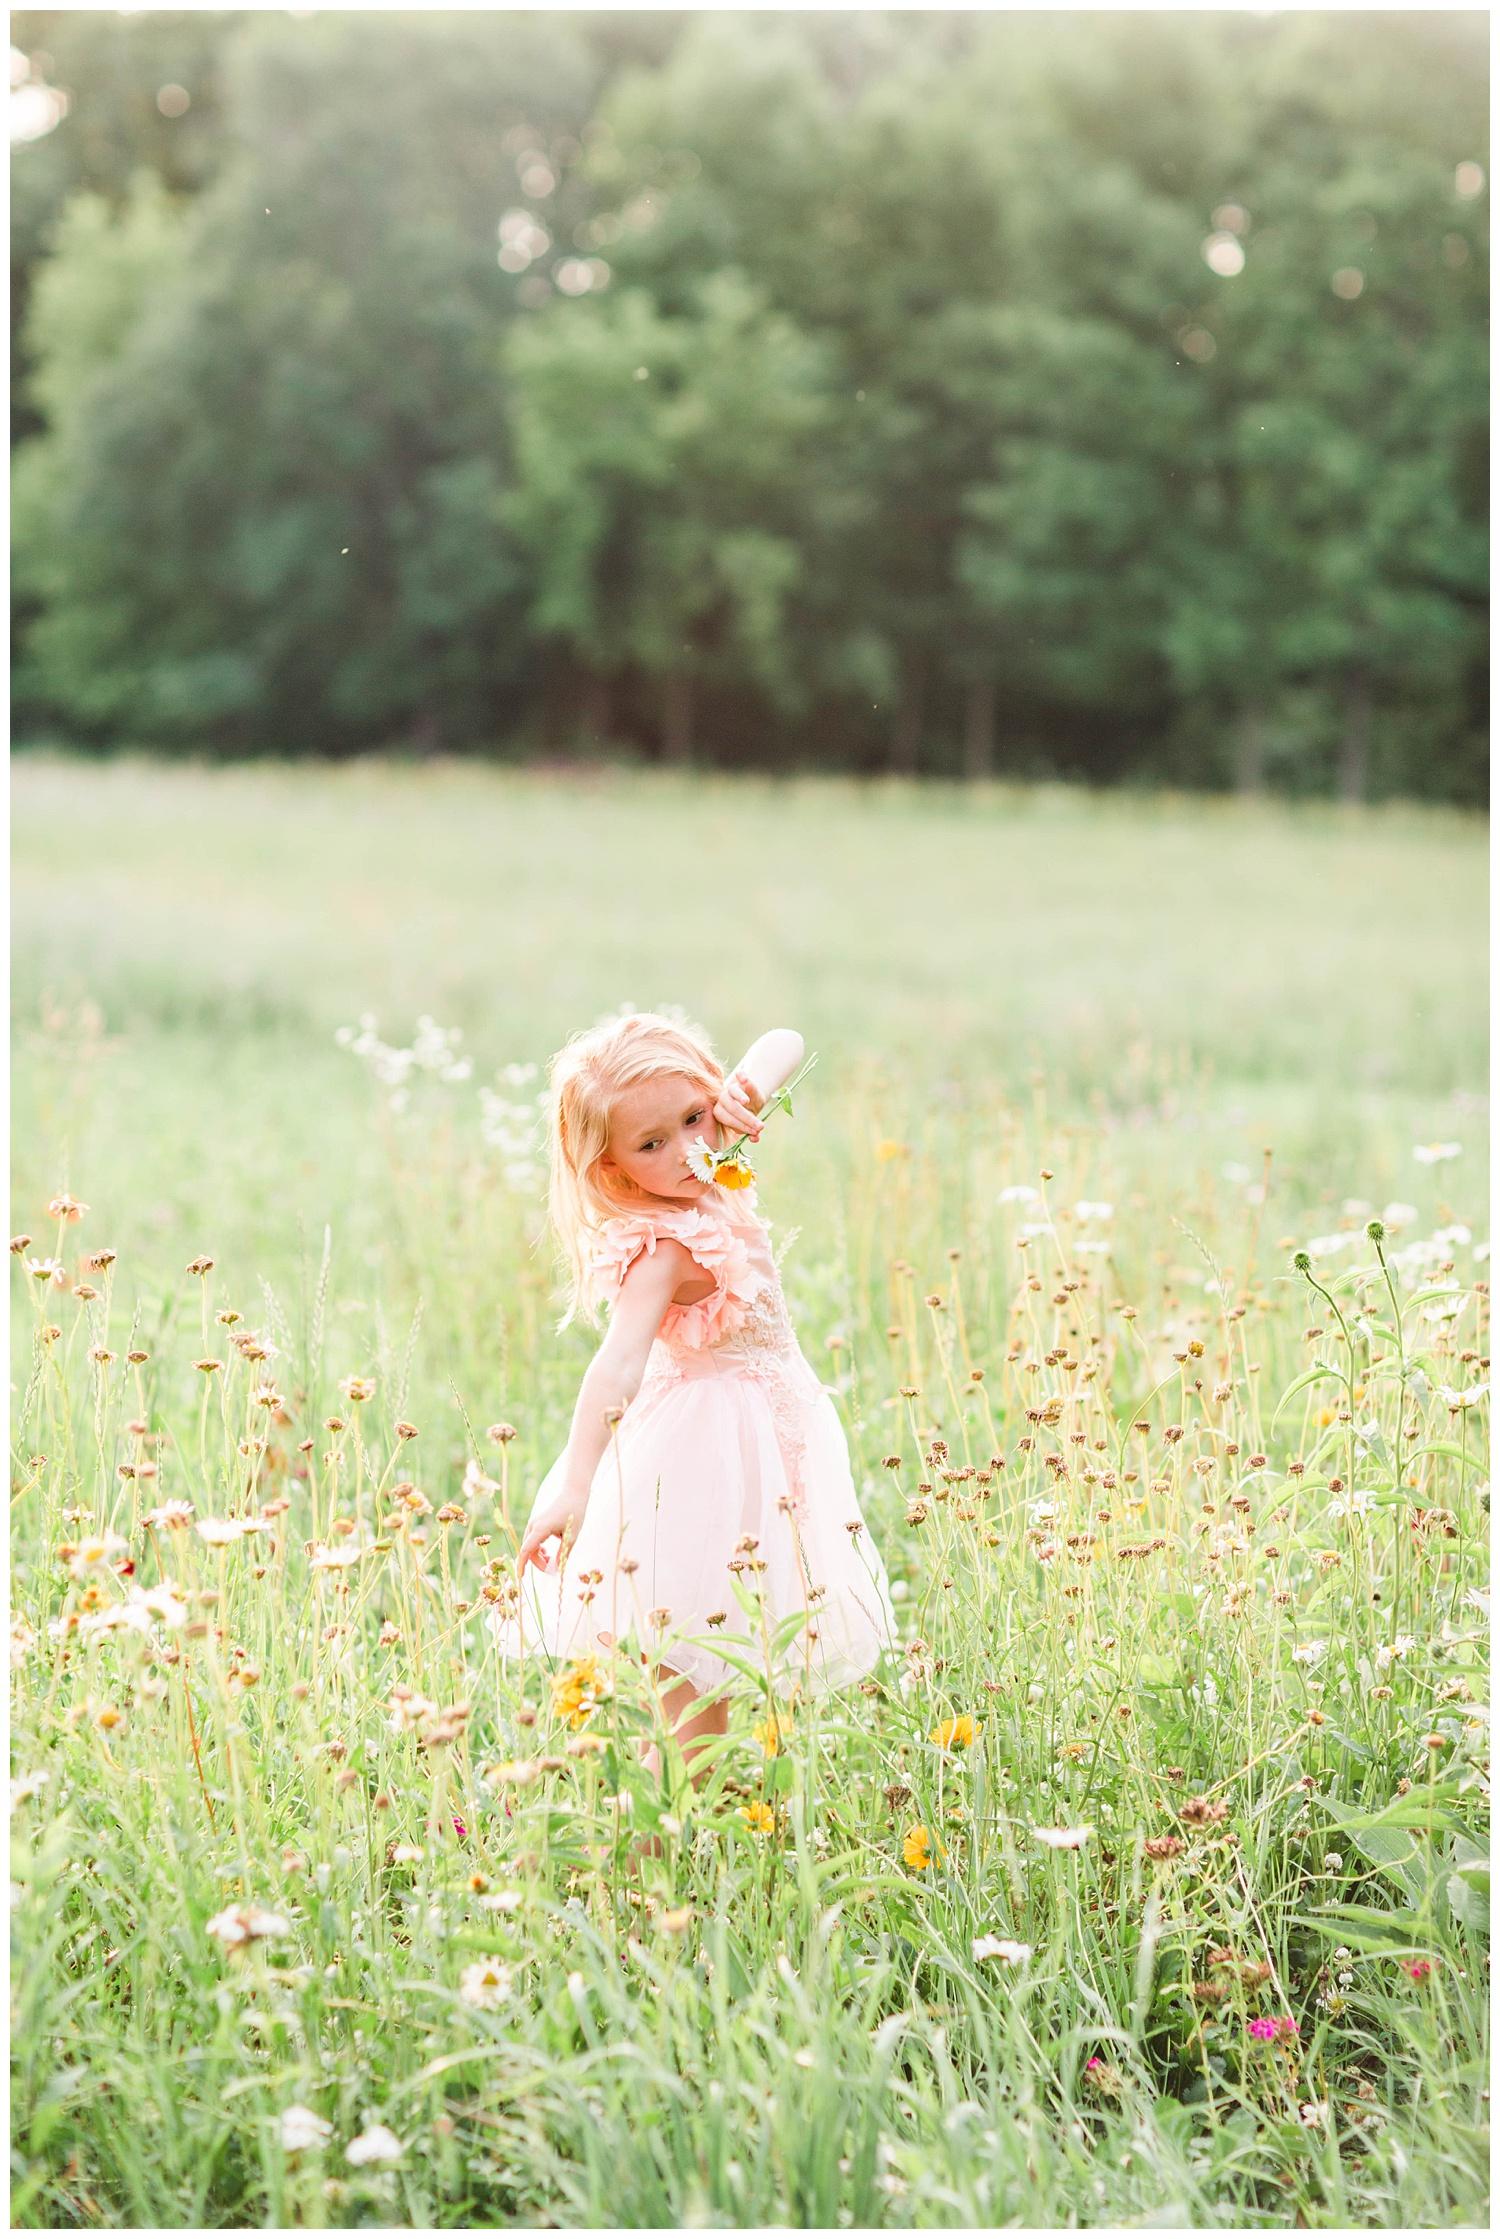 Little Liella dances in a field of wild flowers holding a bouquet wearing tutu du monde couture dress by Trish Scully   CB Studio